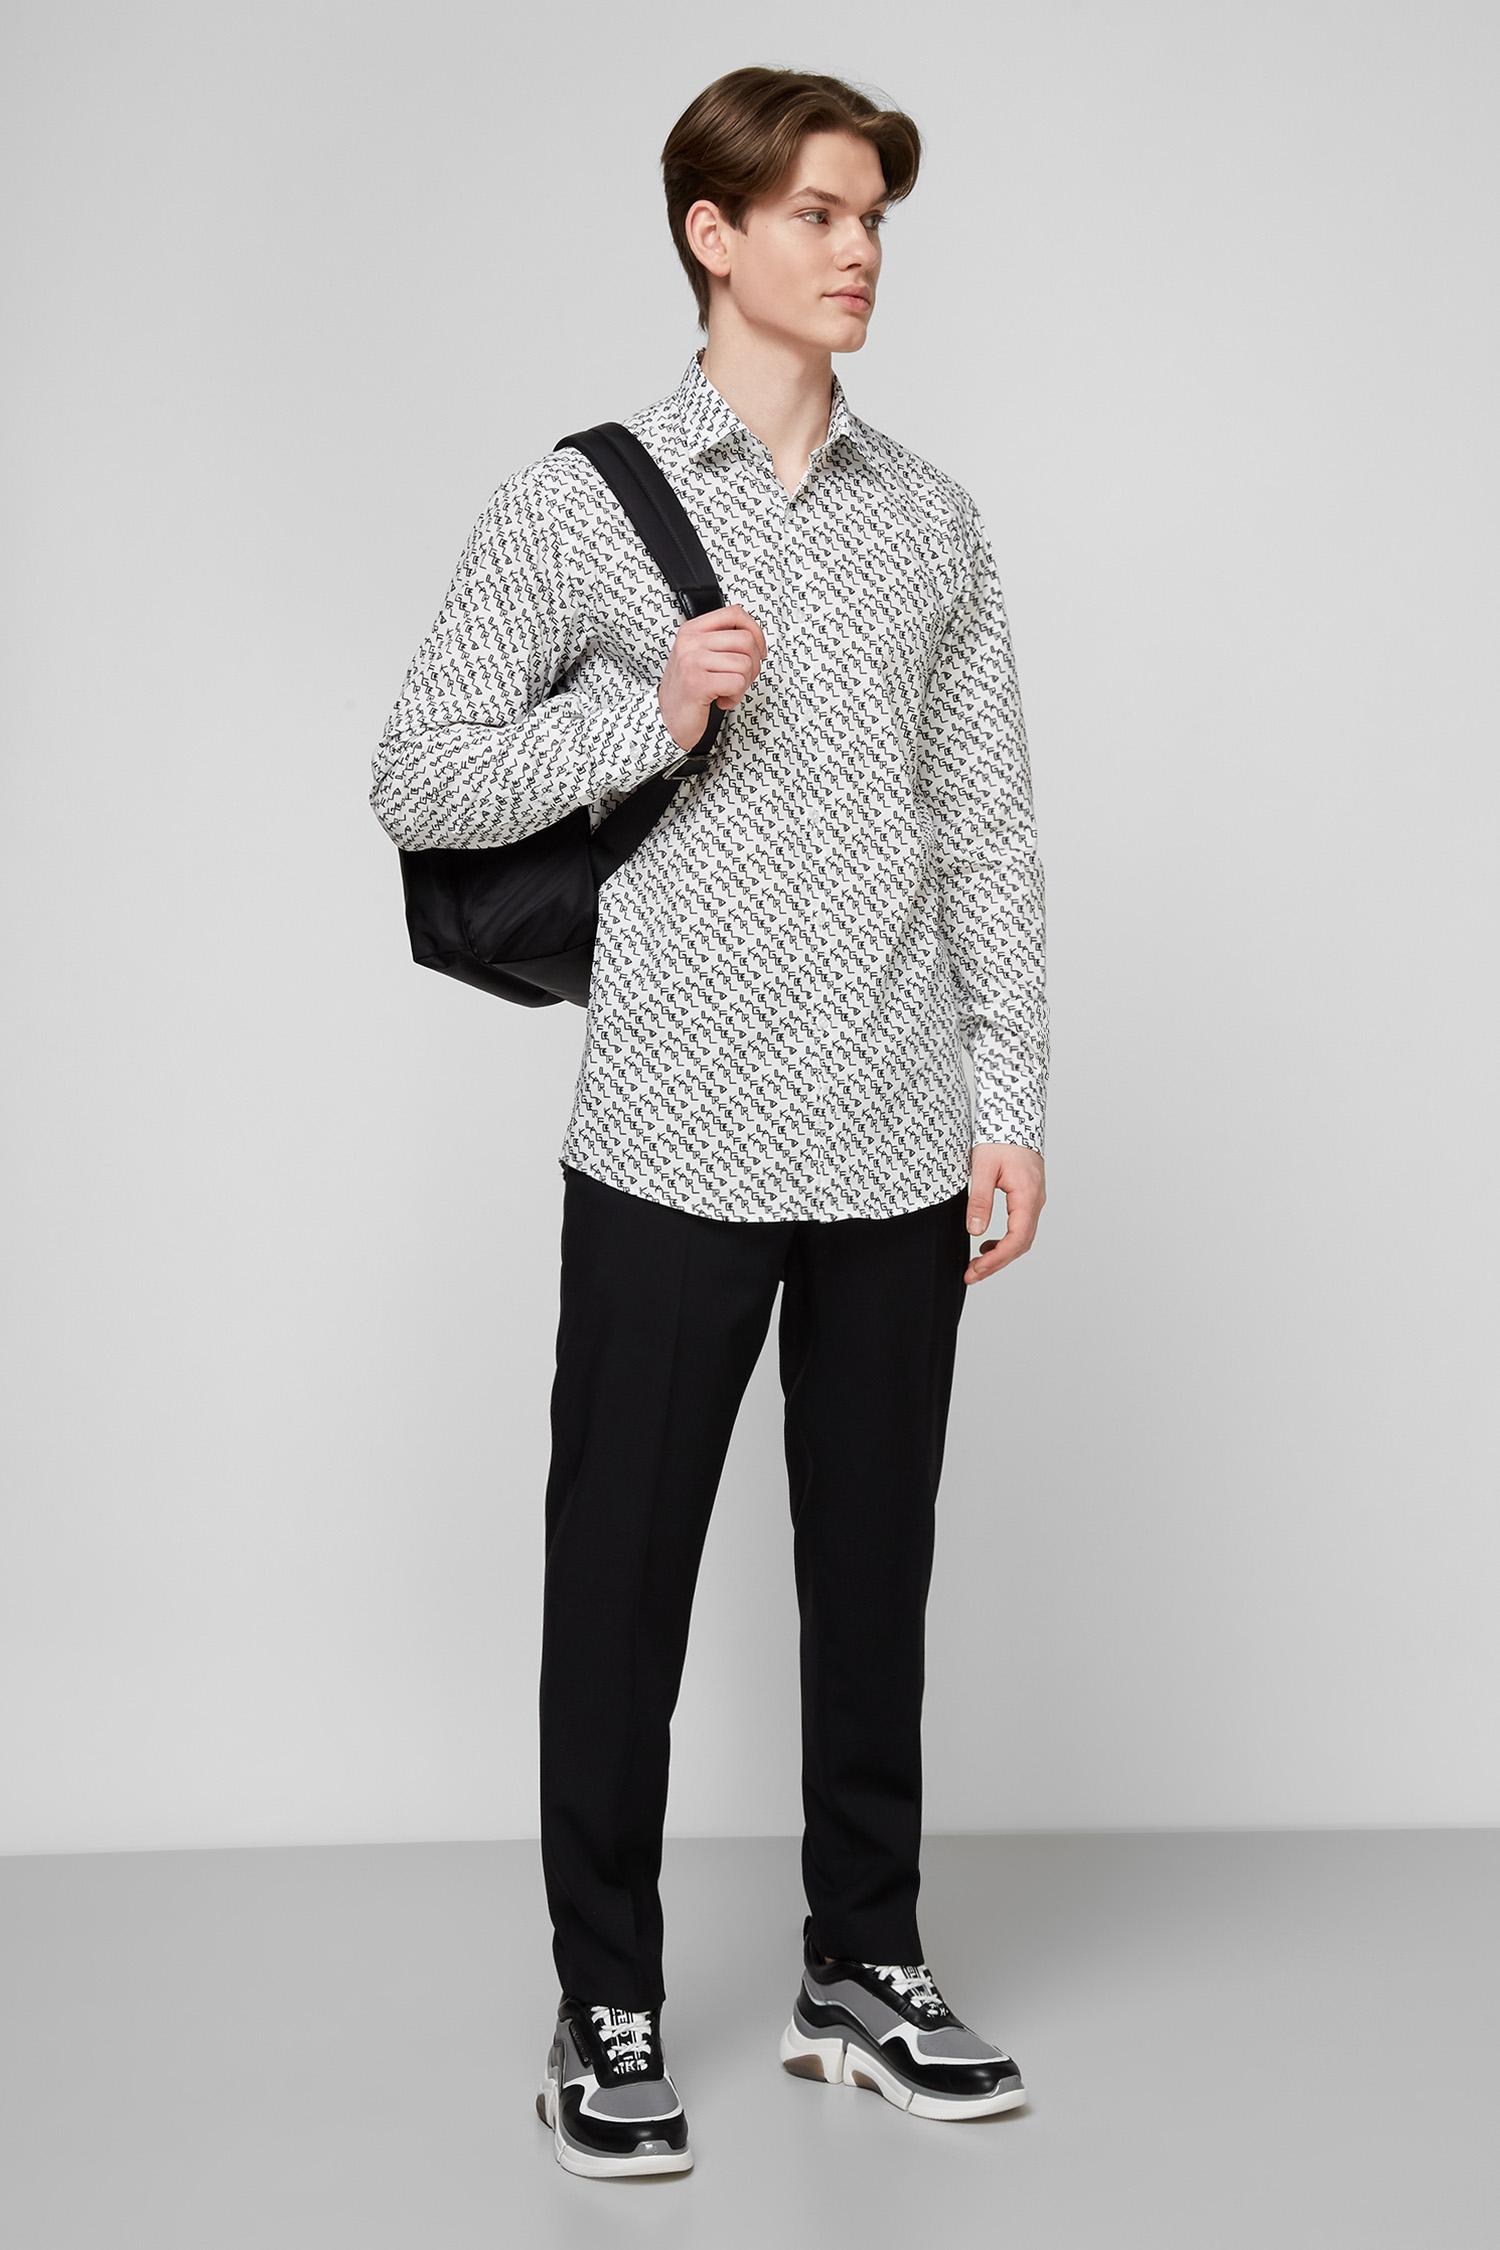 Белая рубашка с принтом для парней Karl Lagerfeld 511650.605003;10